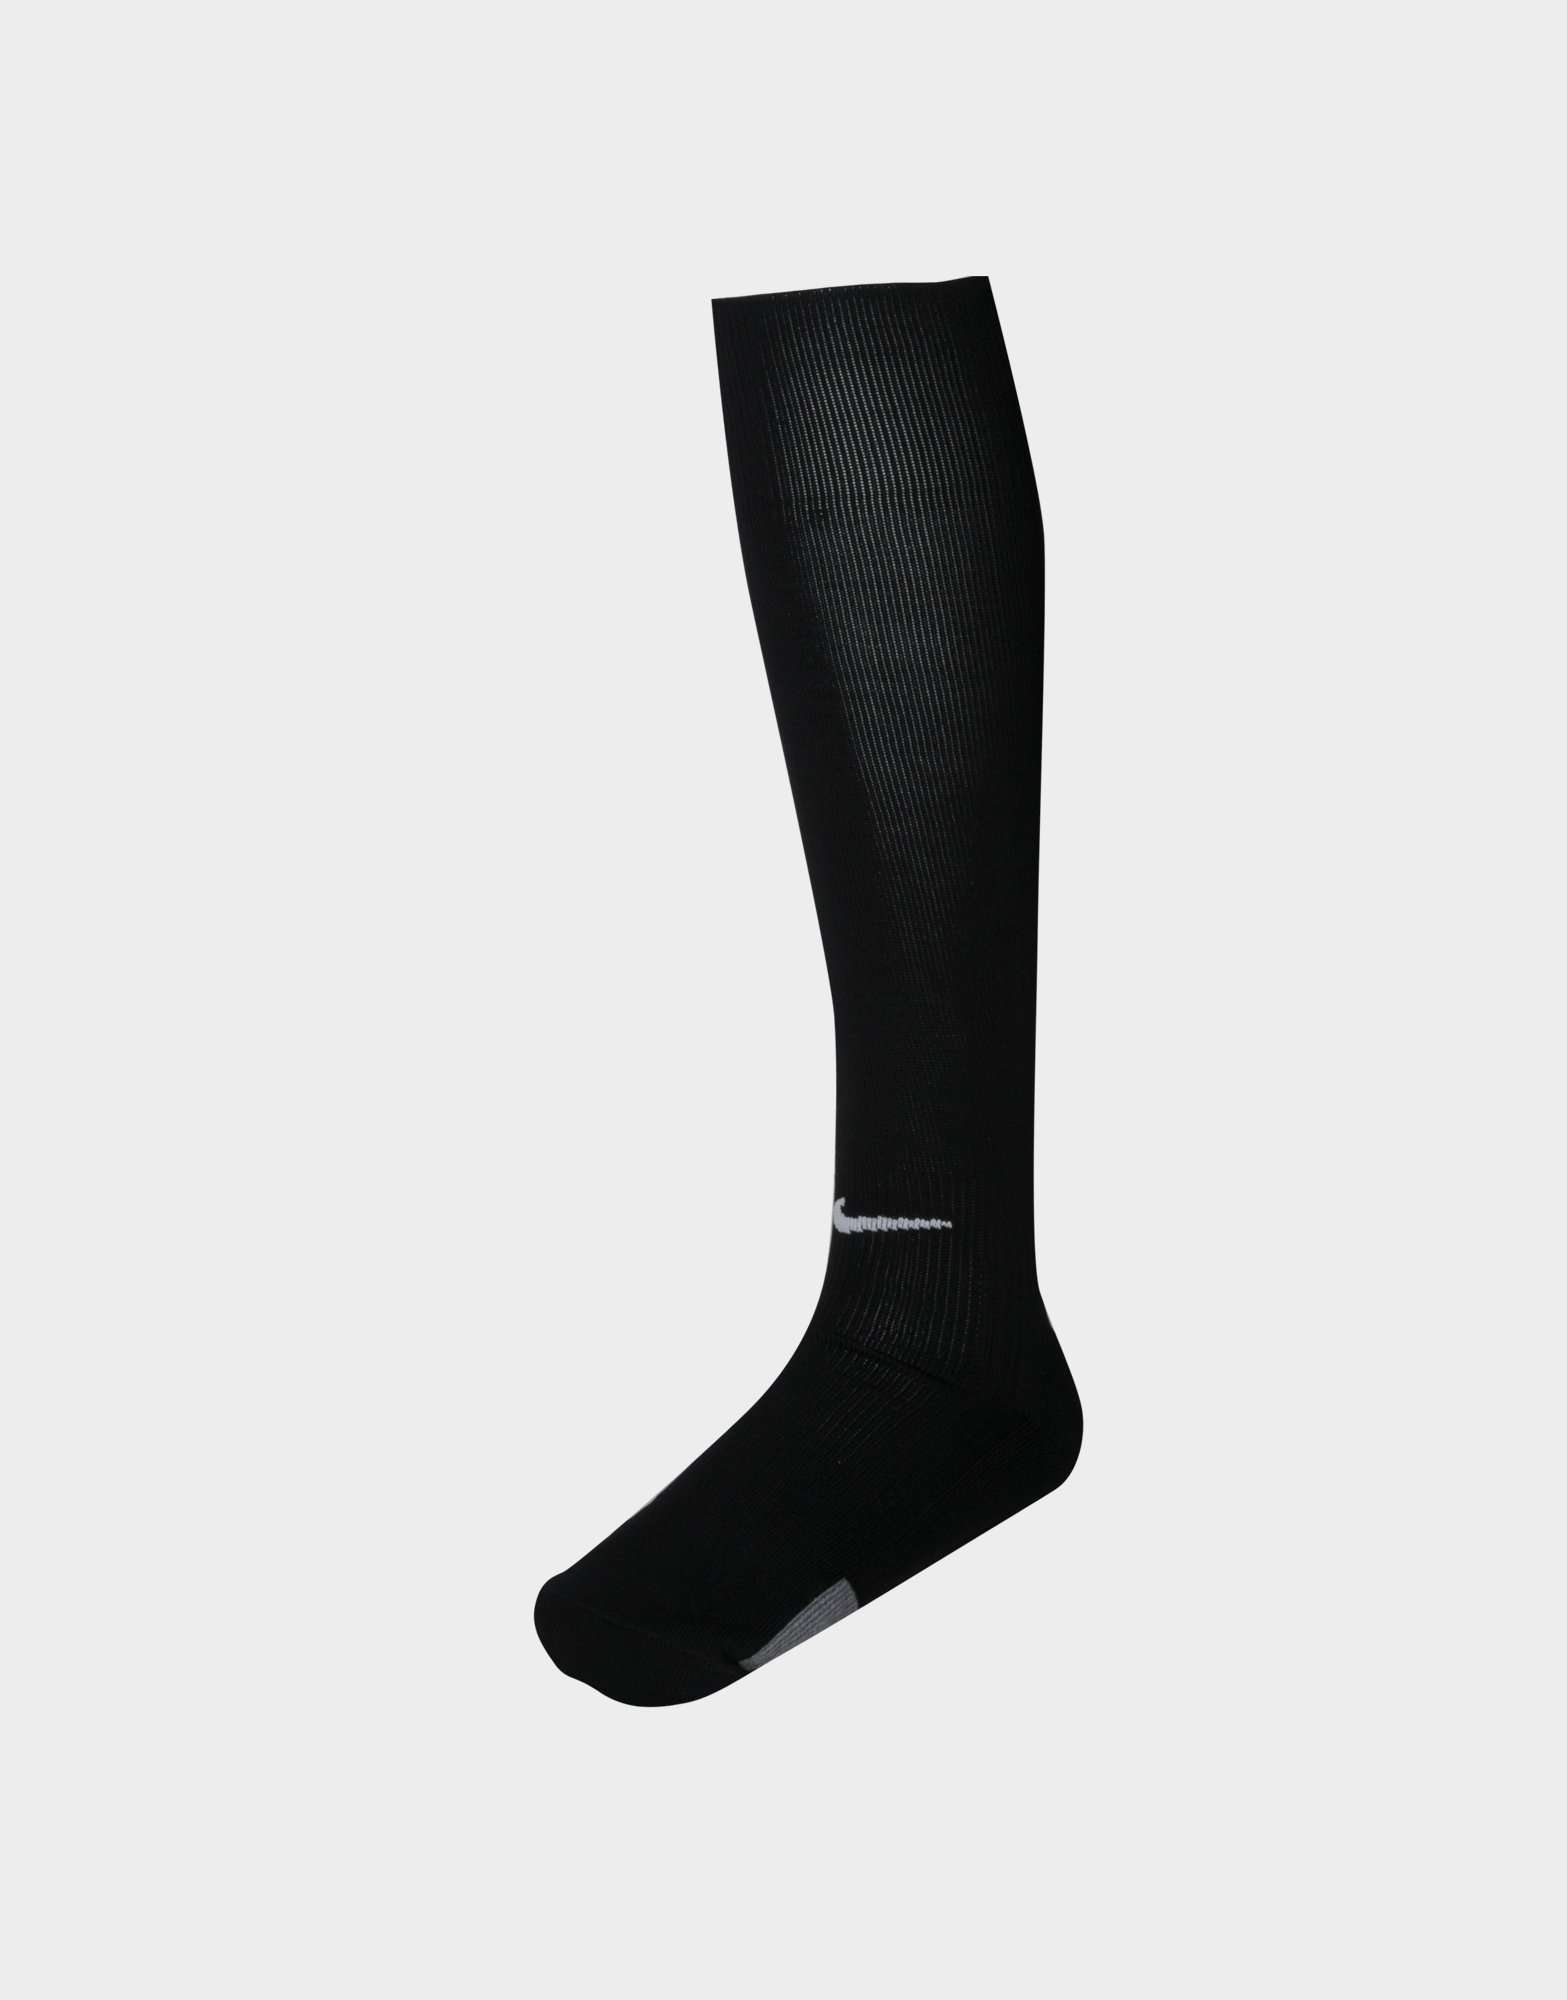 Nike Park IV Football Socks